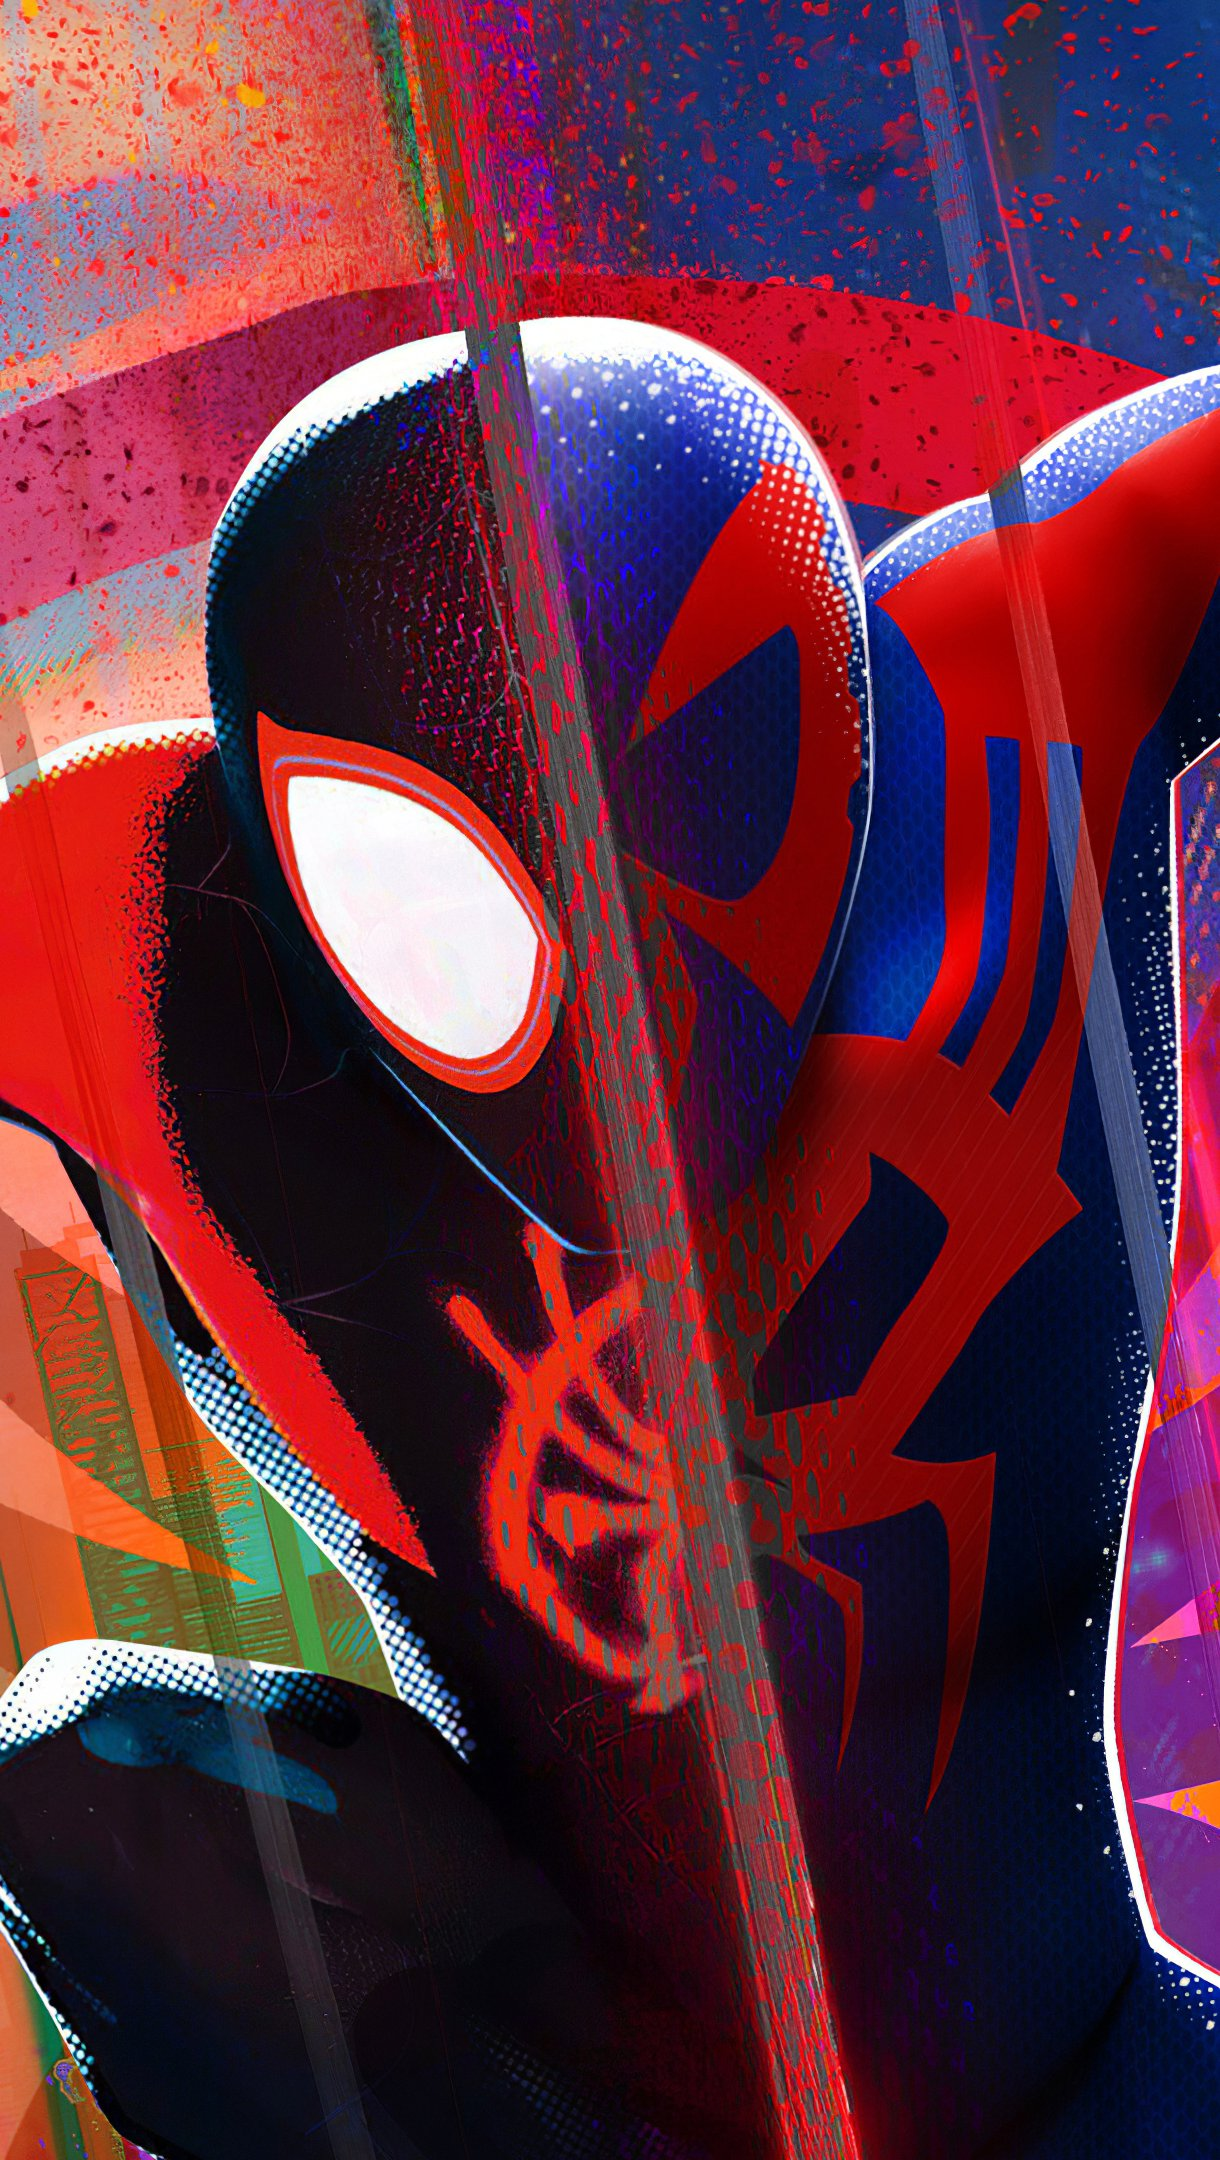 Fondos de pantalla El hombre araña Miles Morales Vertical